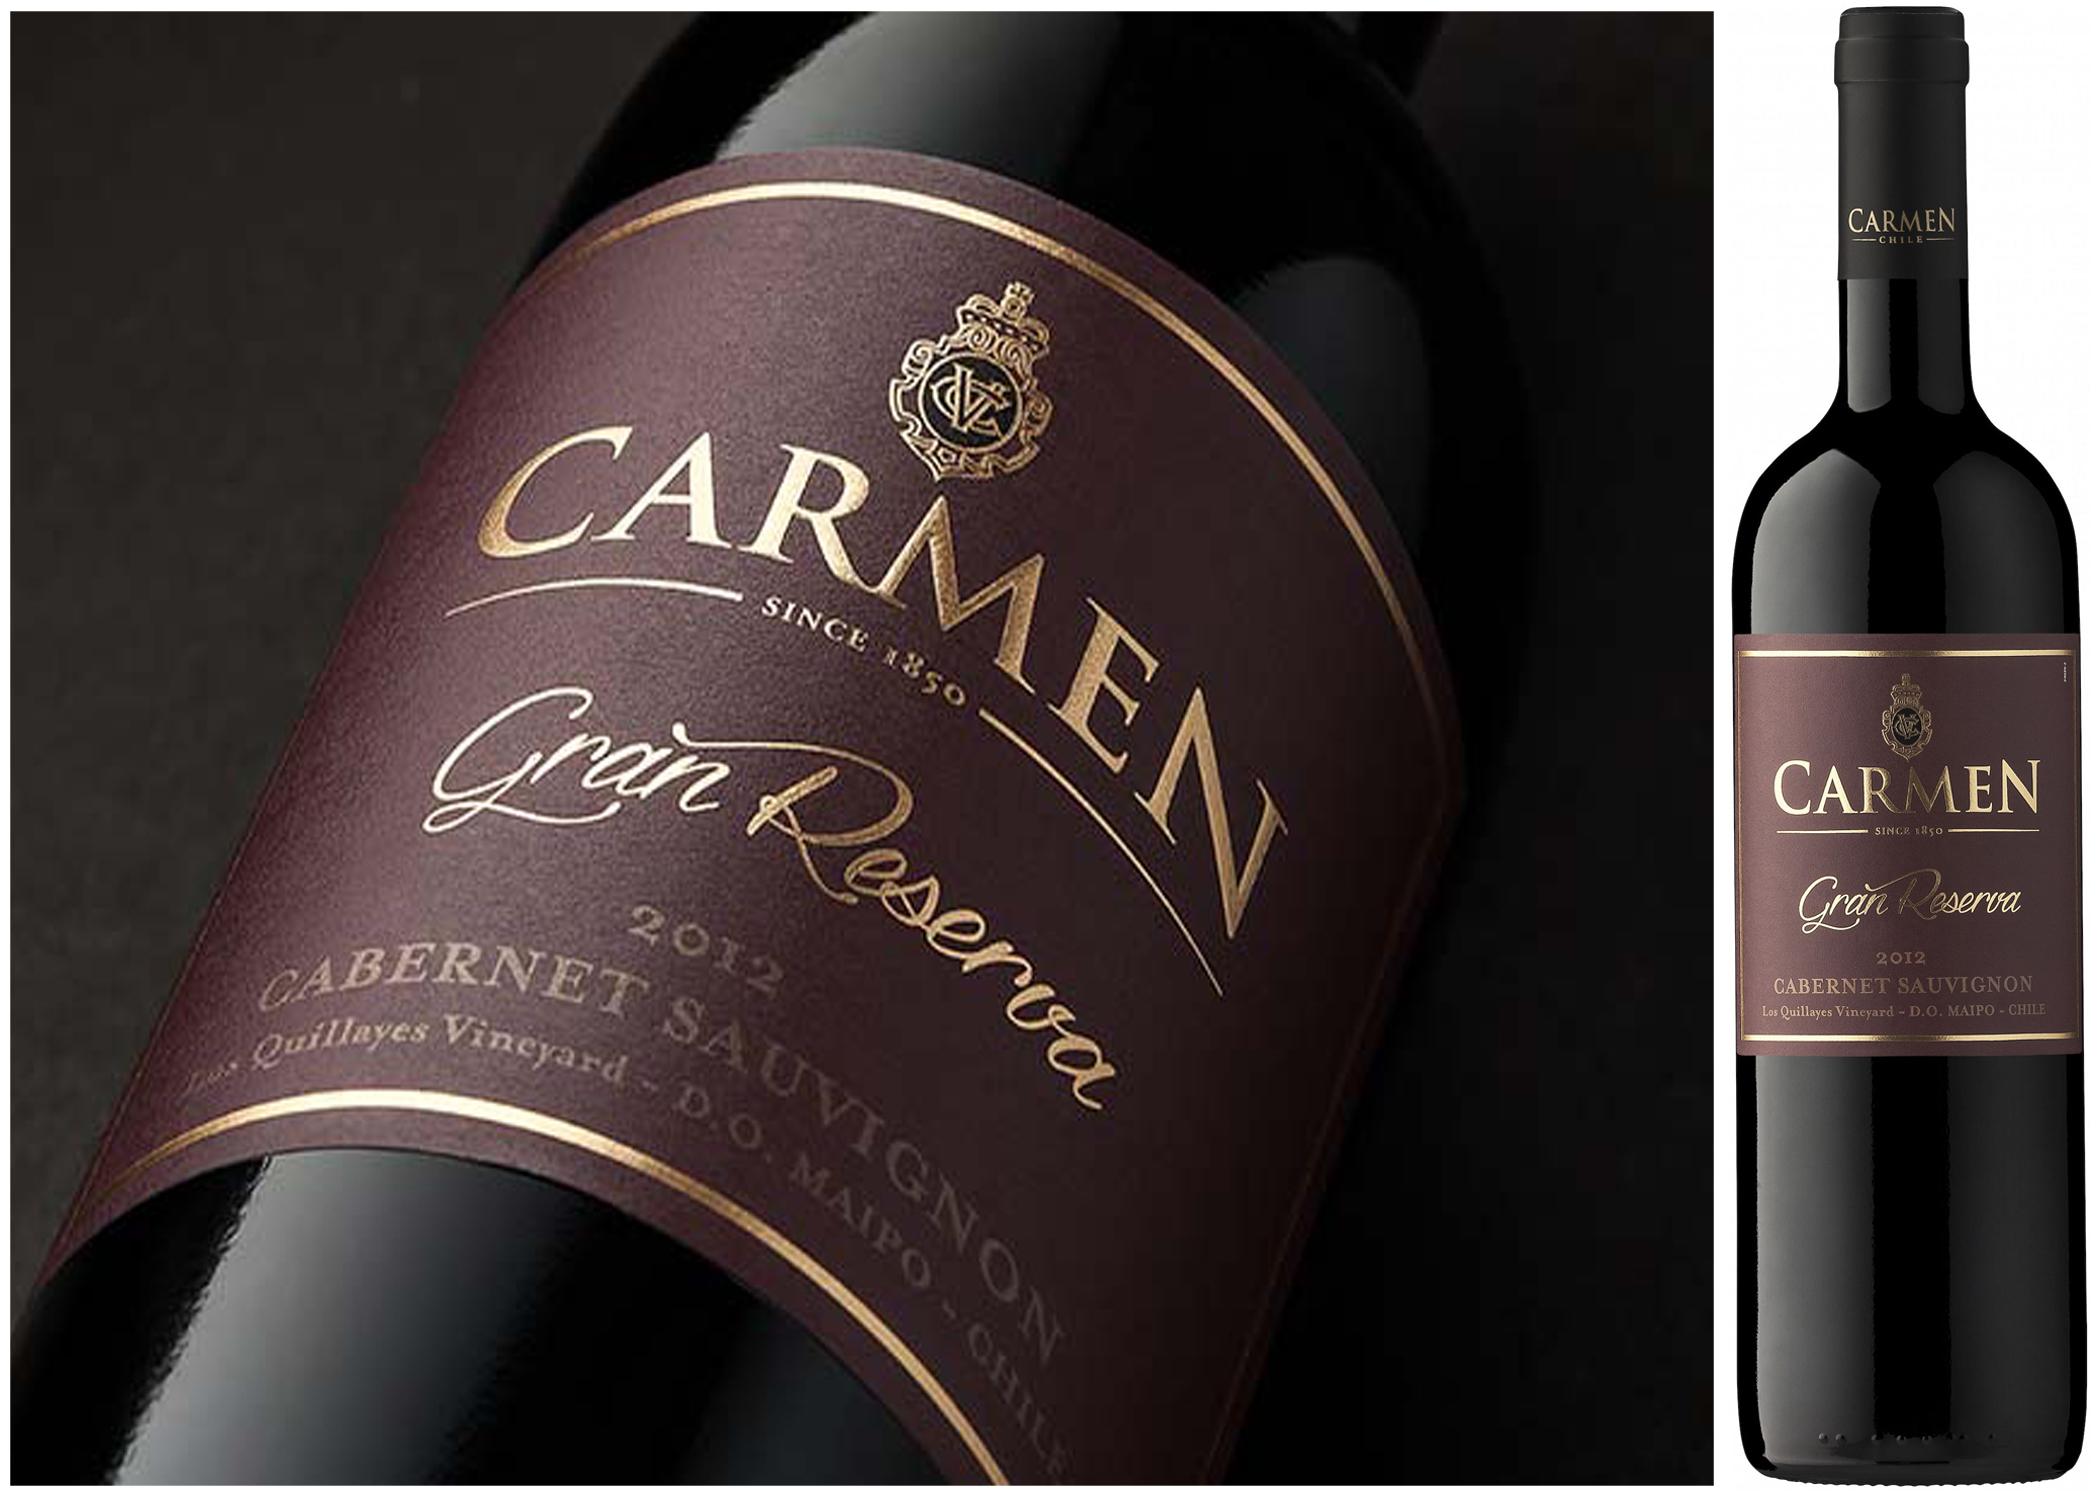 Kết quả hình ảnh cho carmen GRAN RESERVA cabernet sauvignon